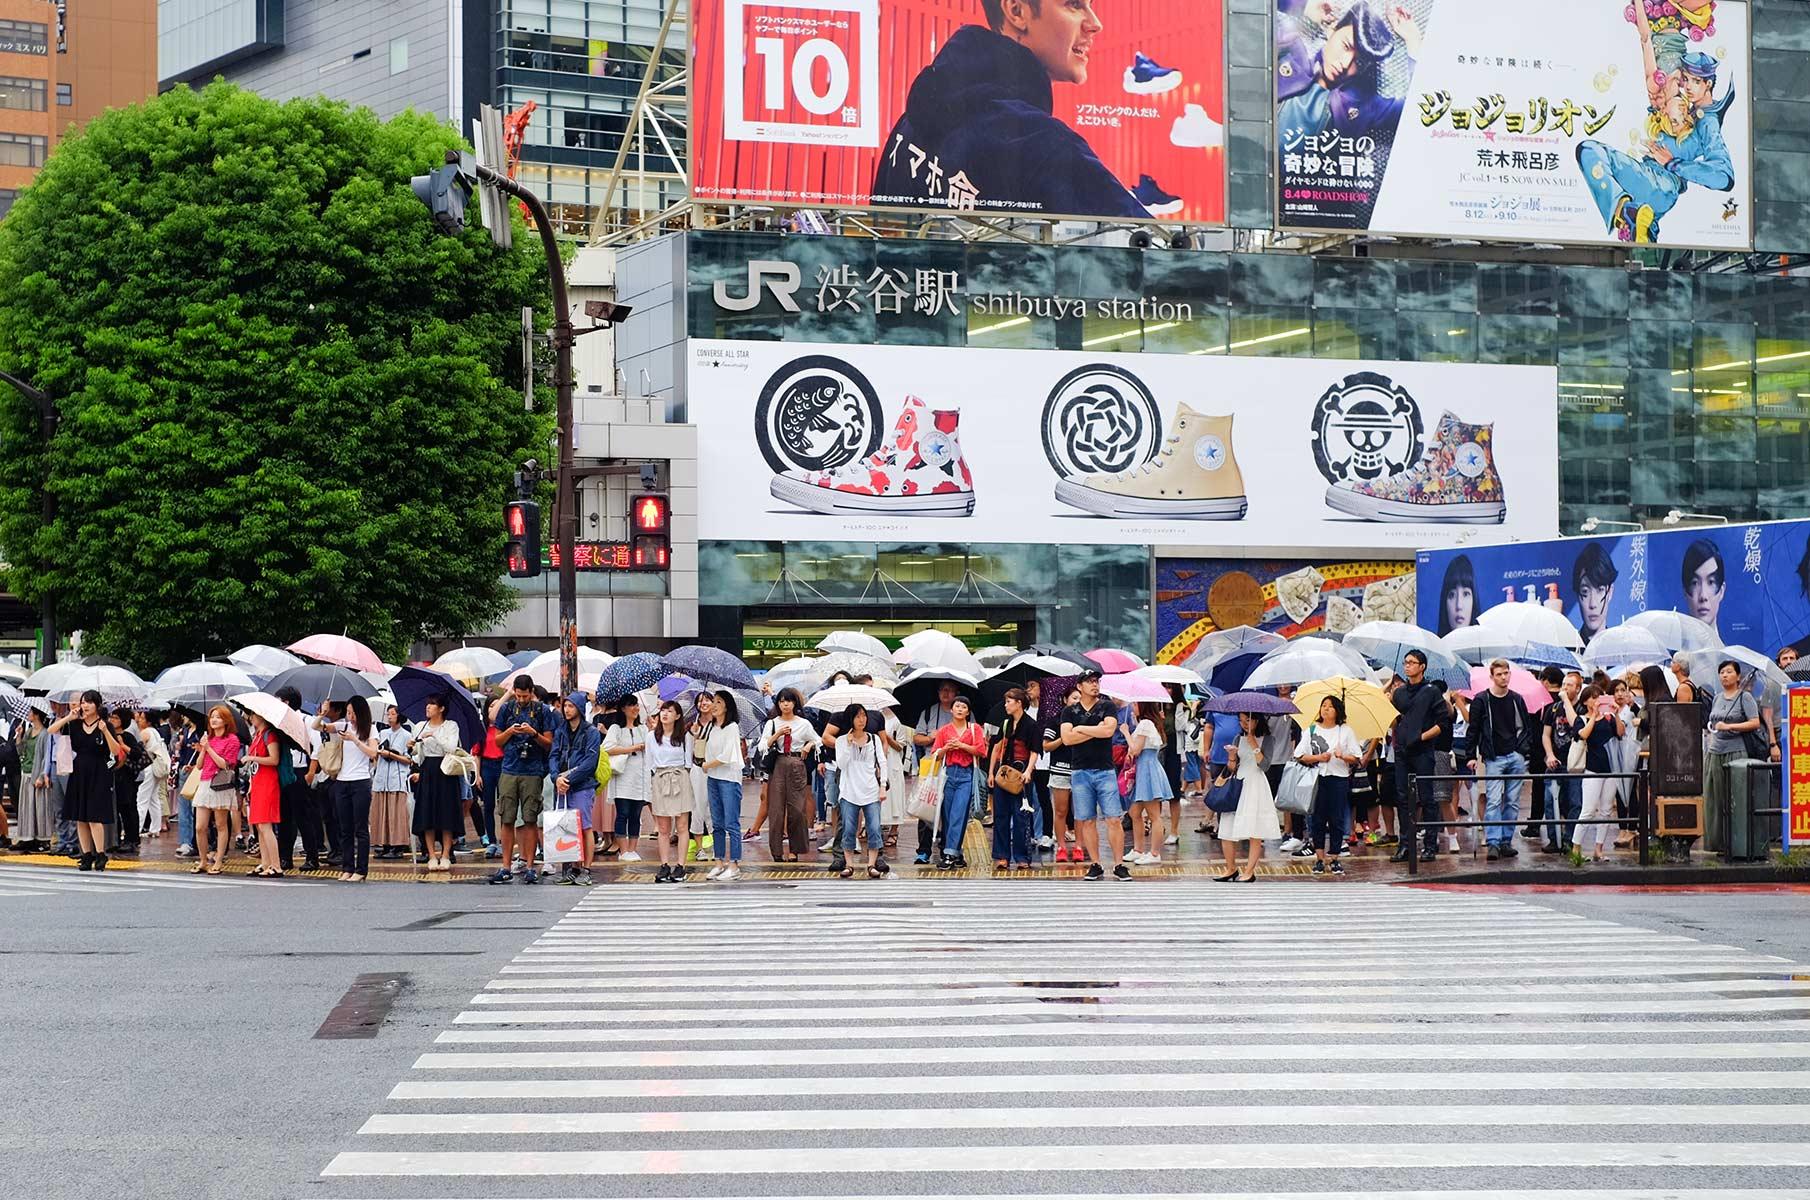 Shibuya Kreuzung in Tokyo, Japan